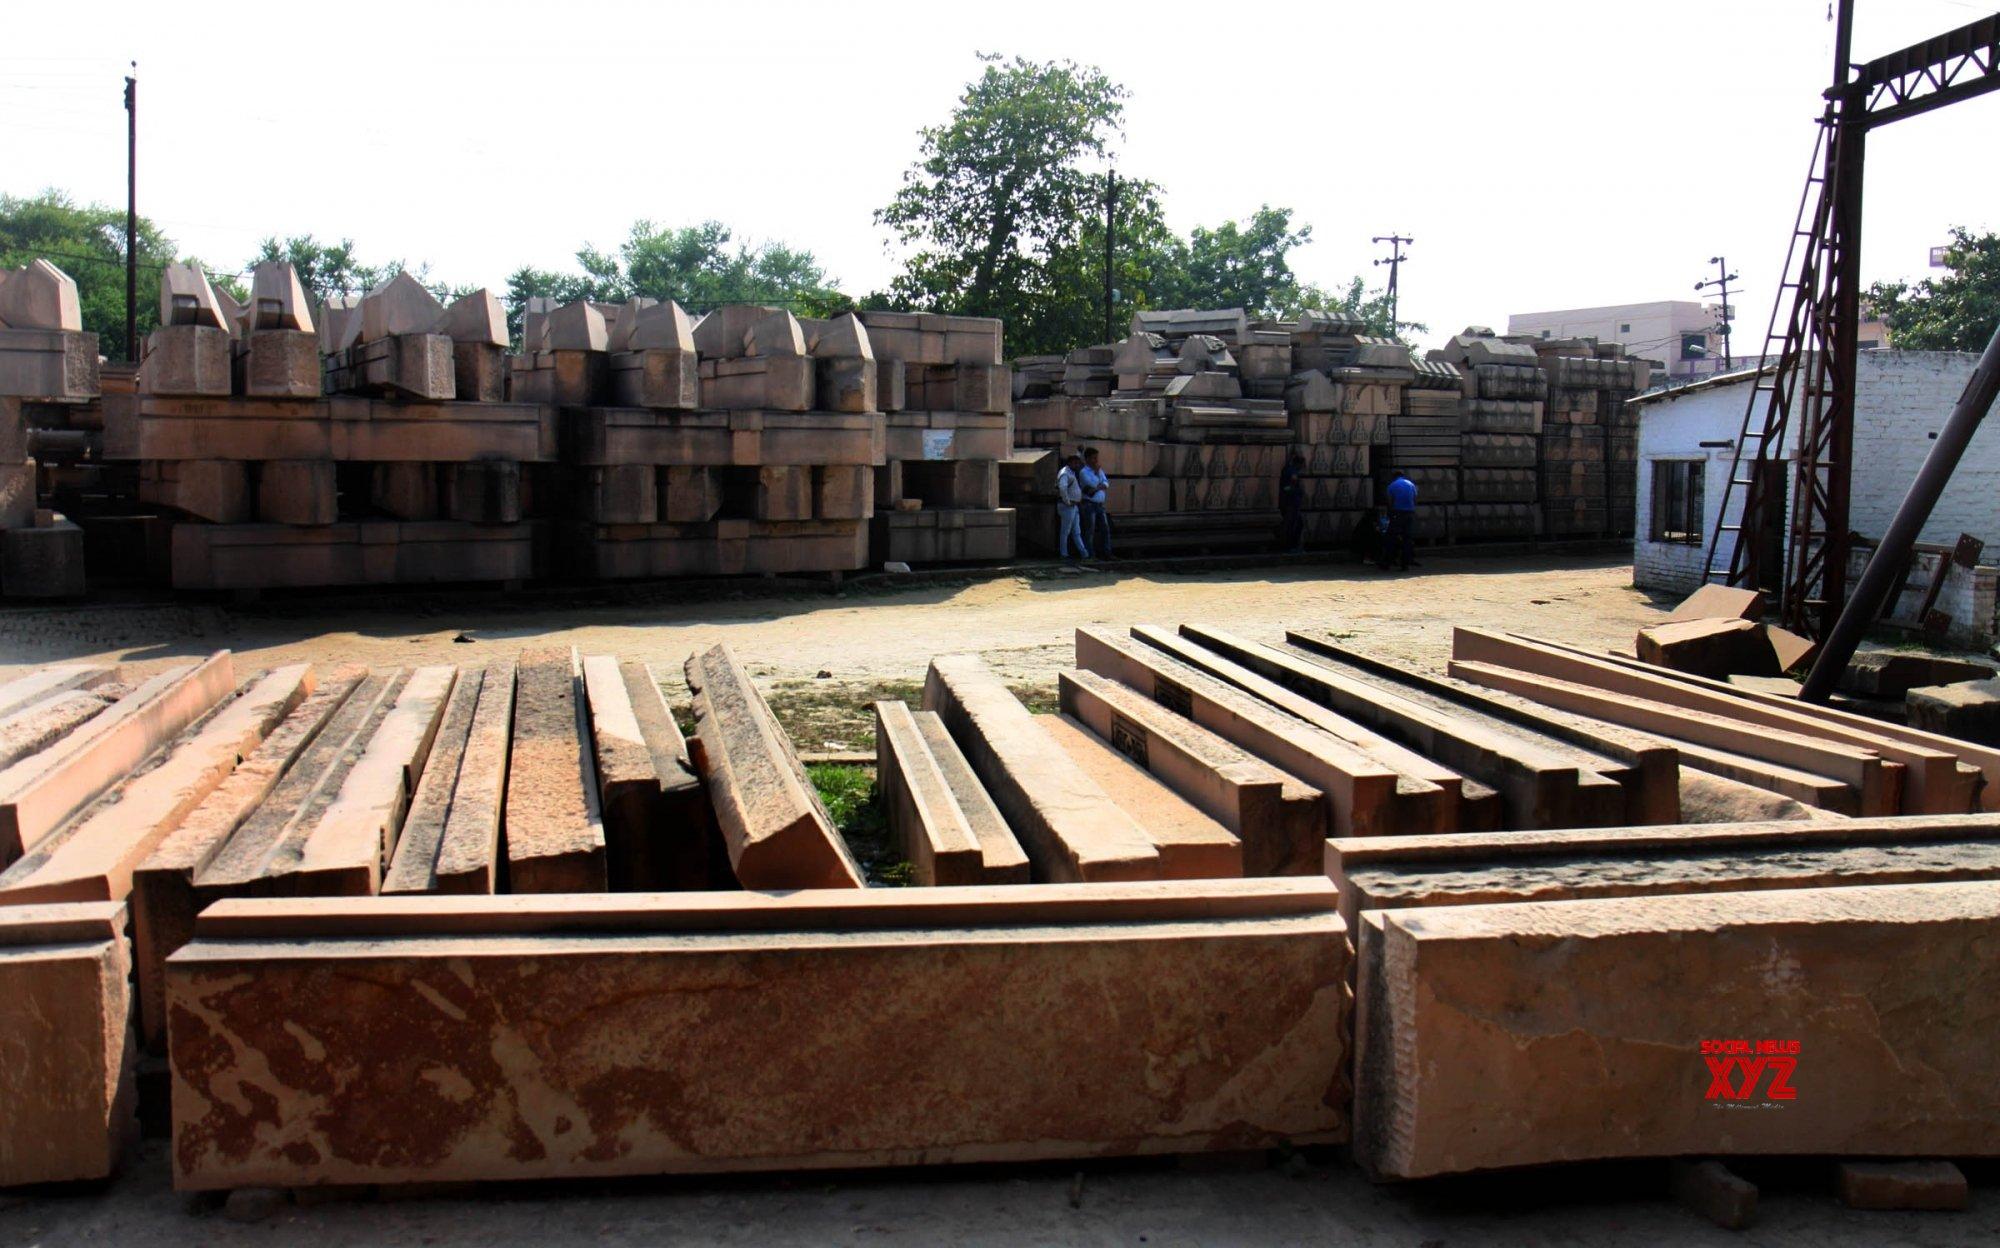 Ayodhya verdict: Ram Lalla represented by 'next friend' Triloki Nath Pandey